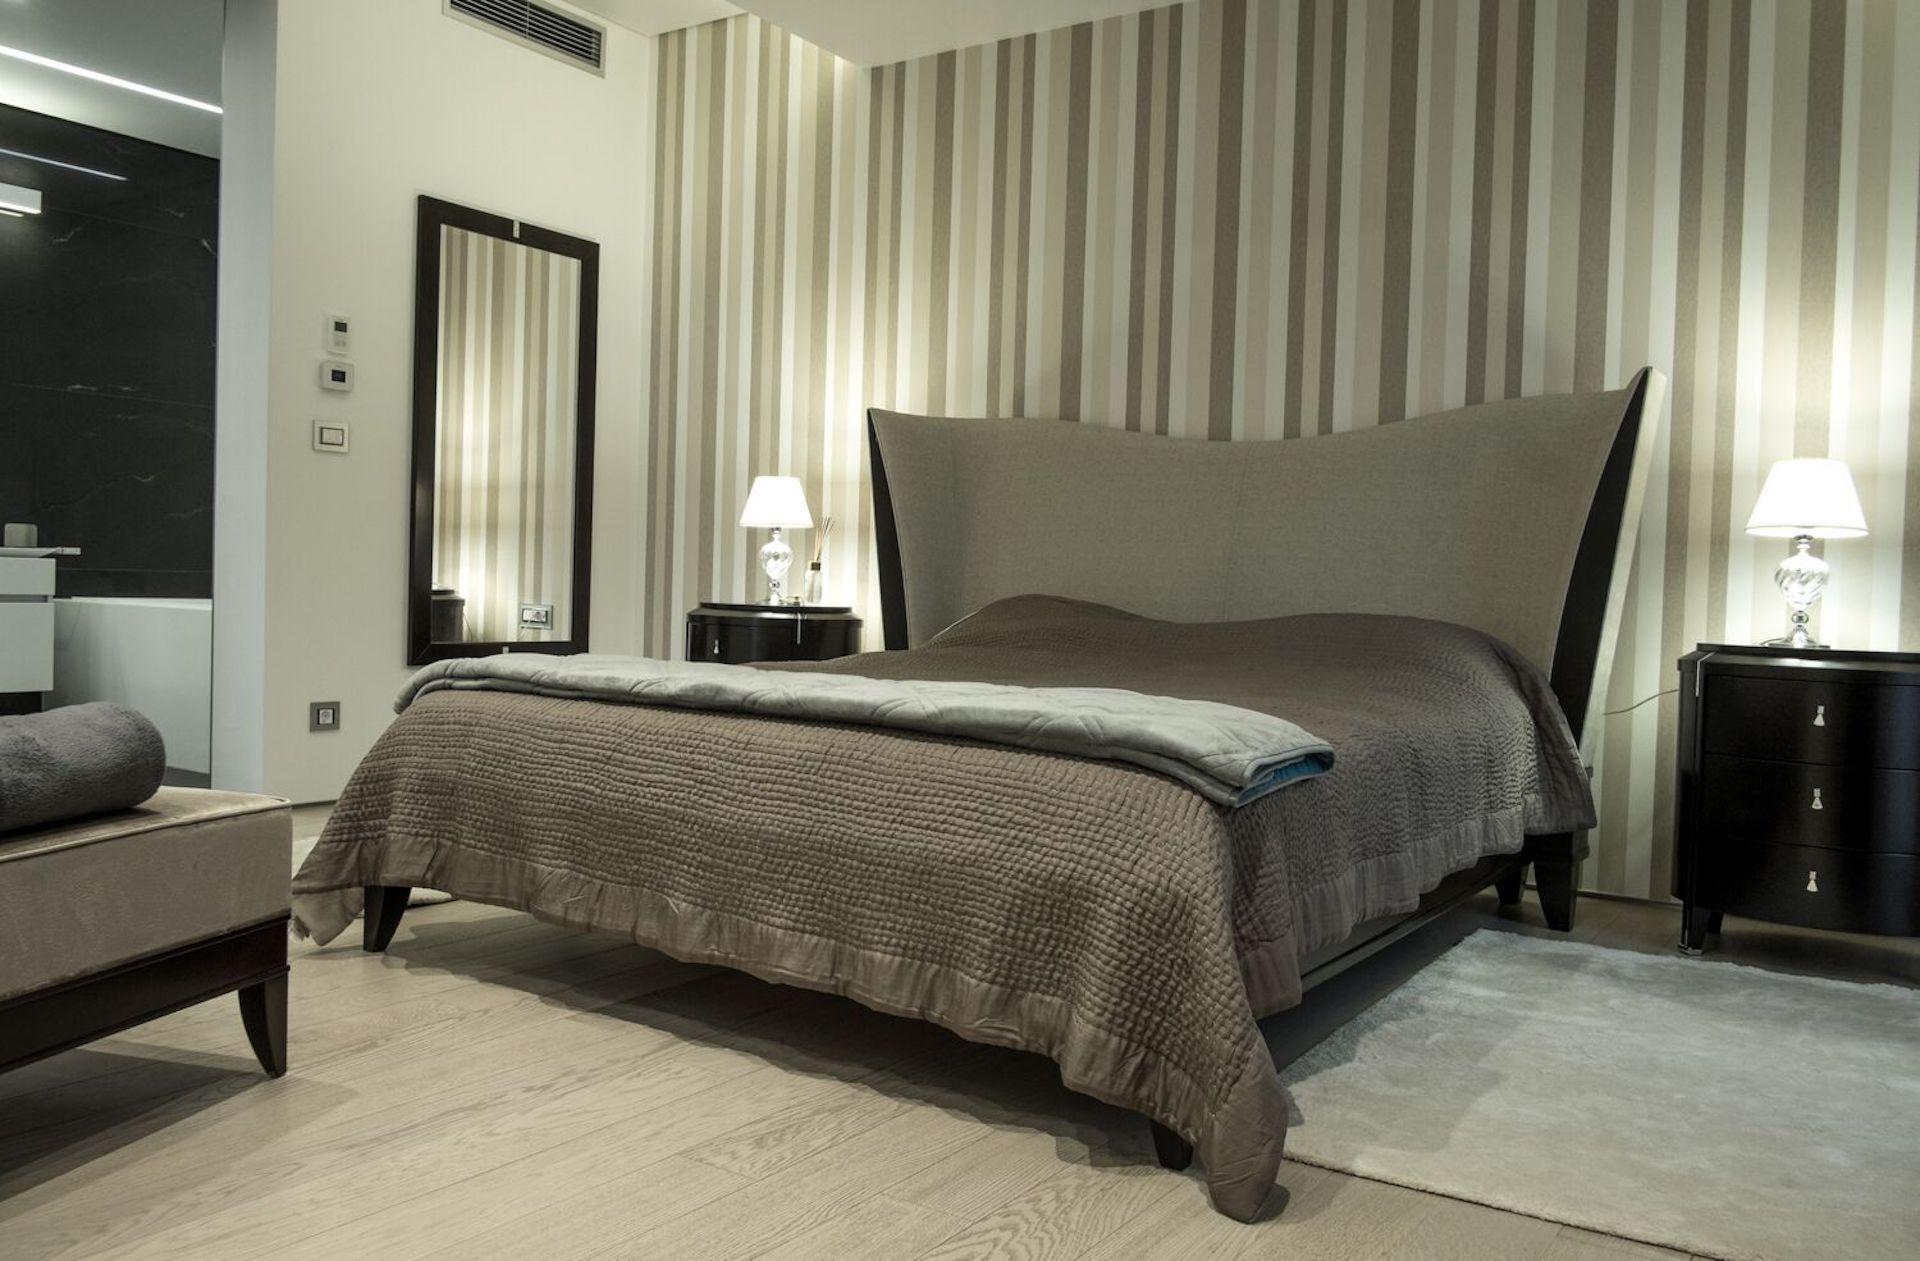 PenthouseDukleyHotel&Resort13.jpg